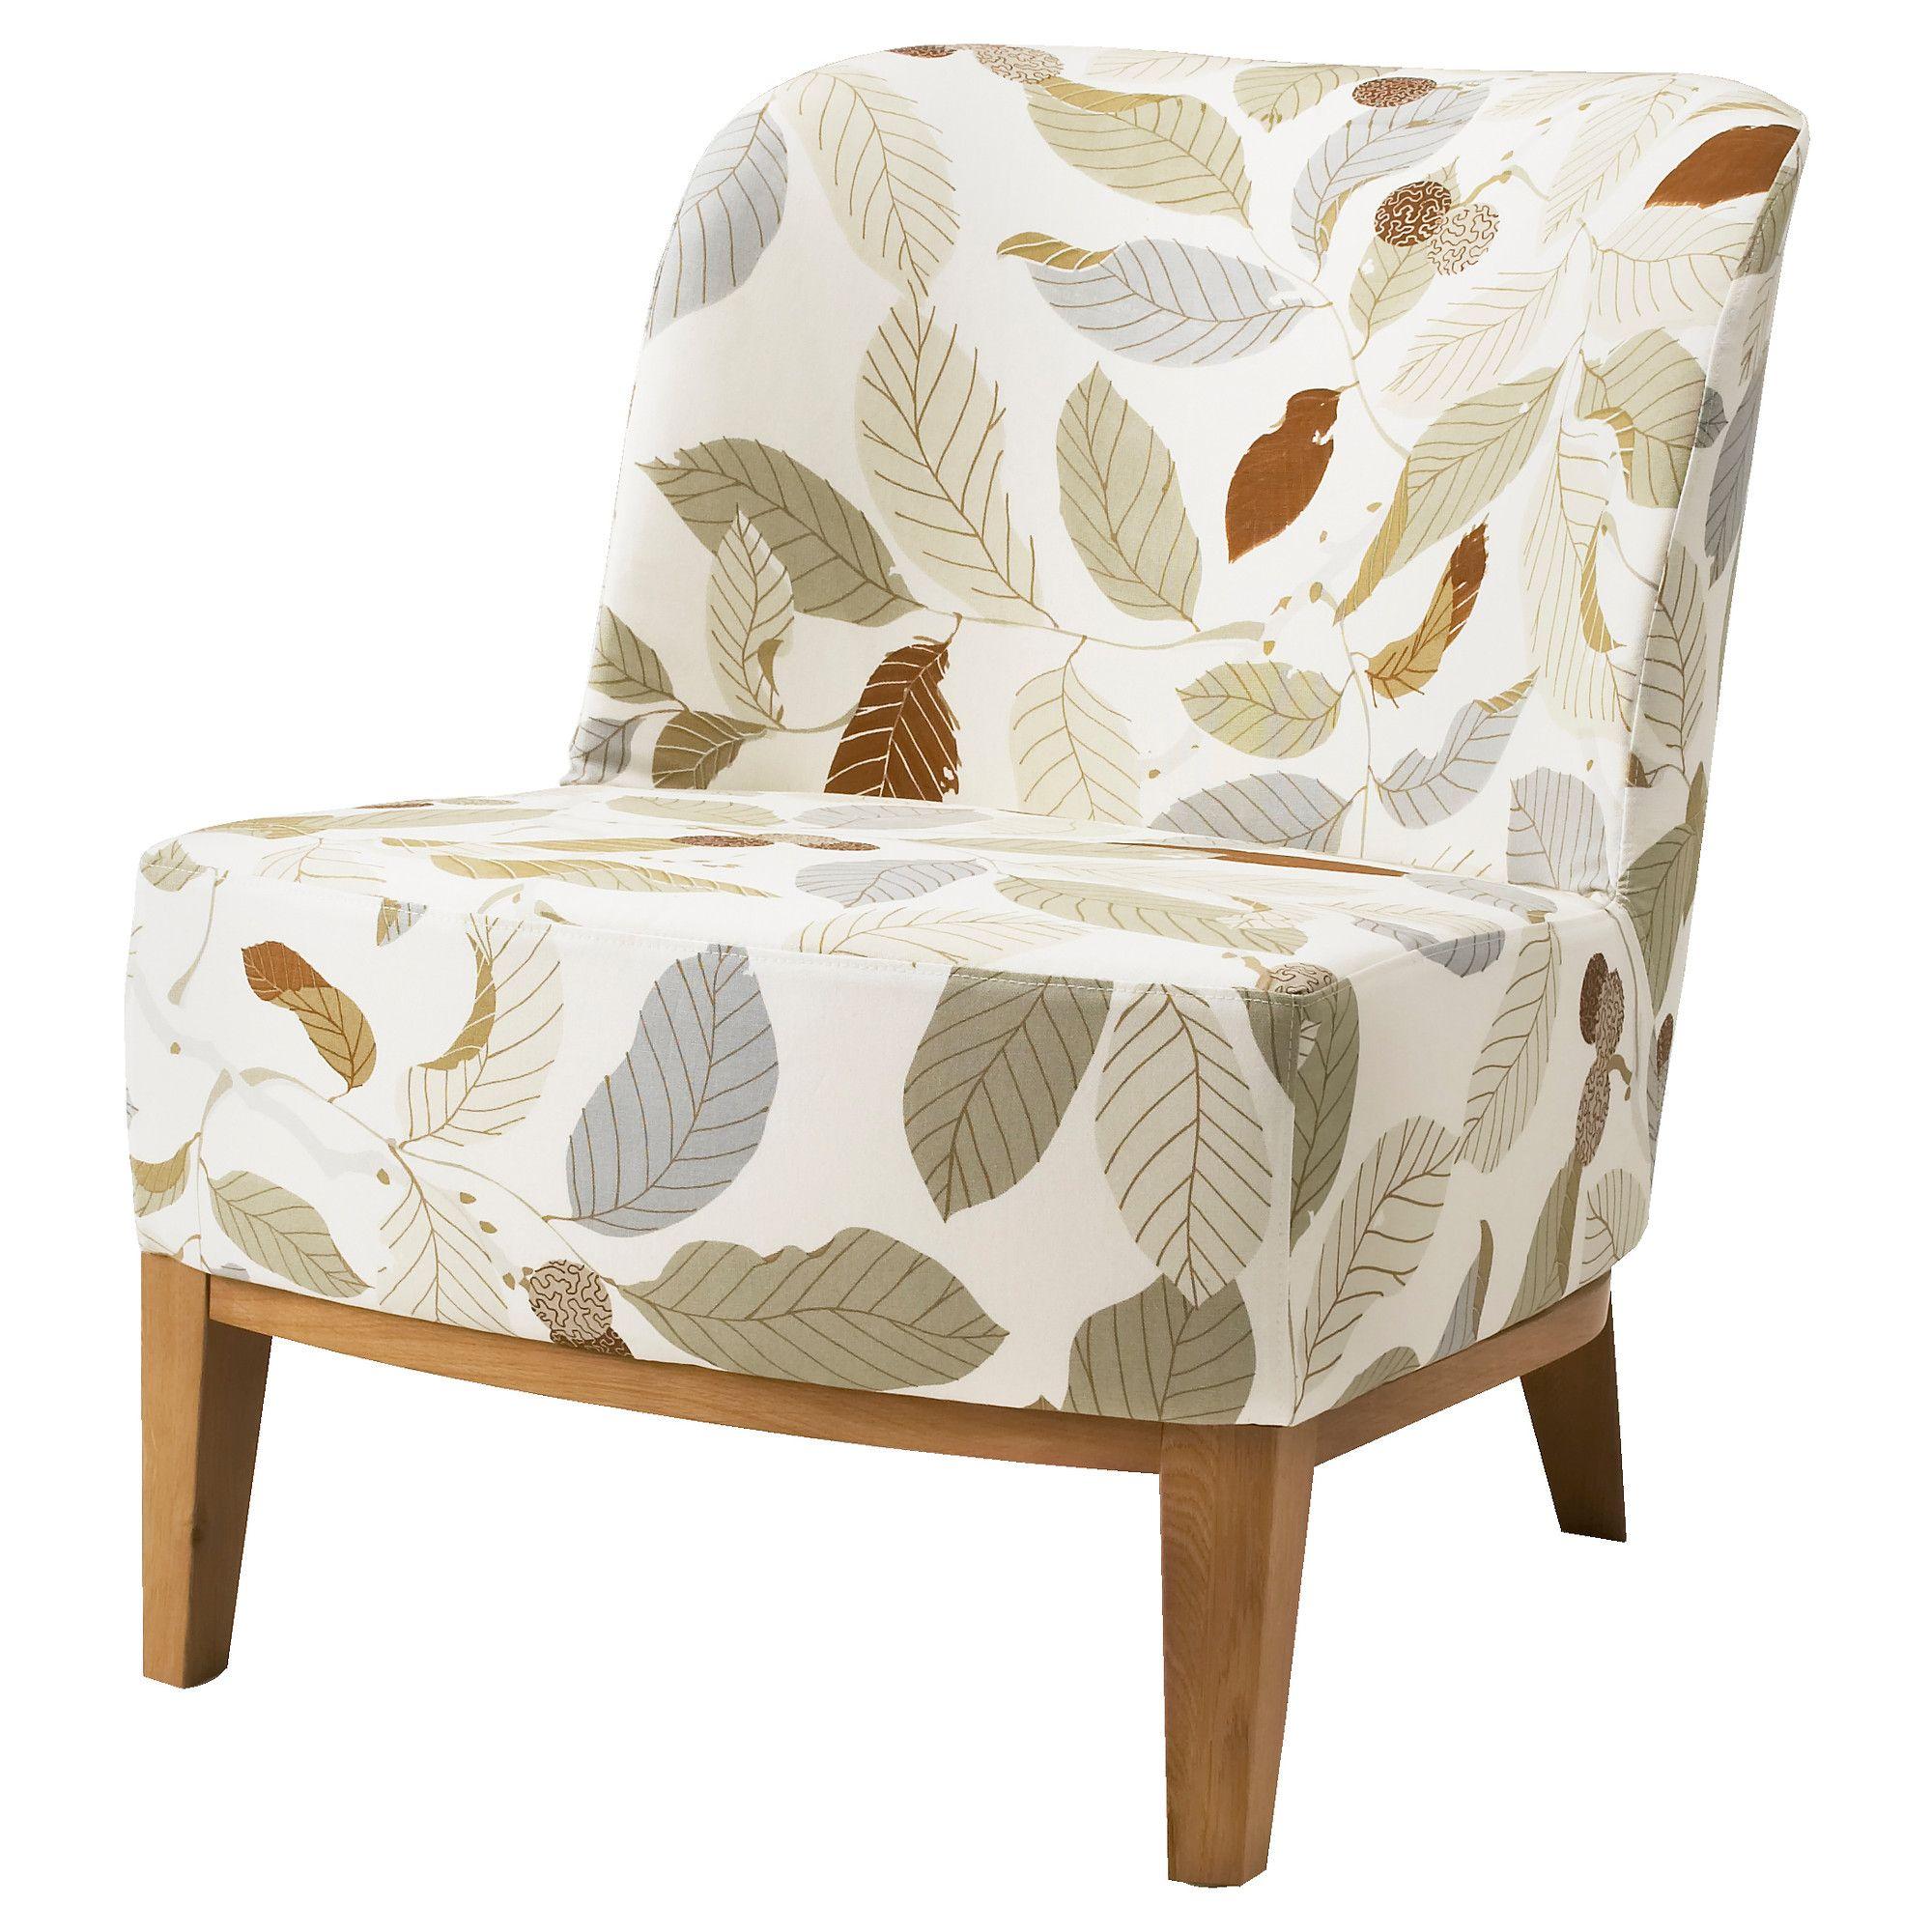 US Furniture and Home Furnishings Ikea stockholm, Ikea